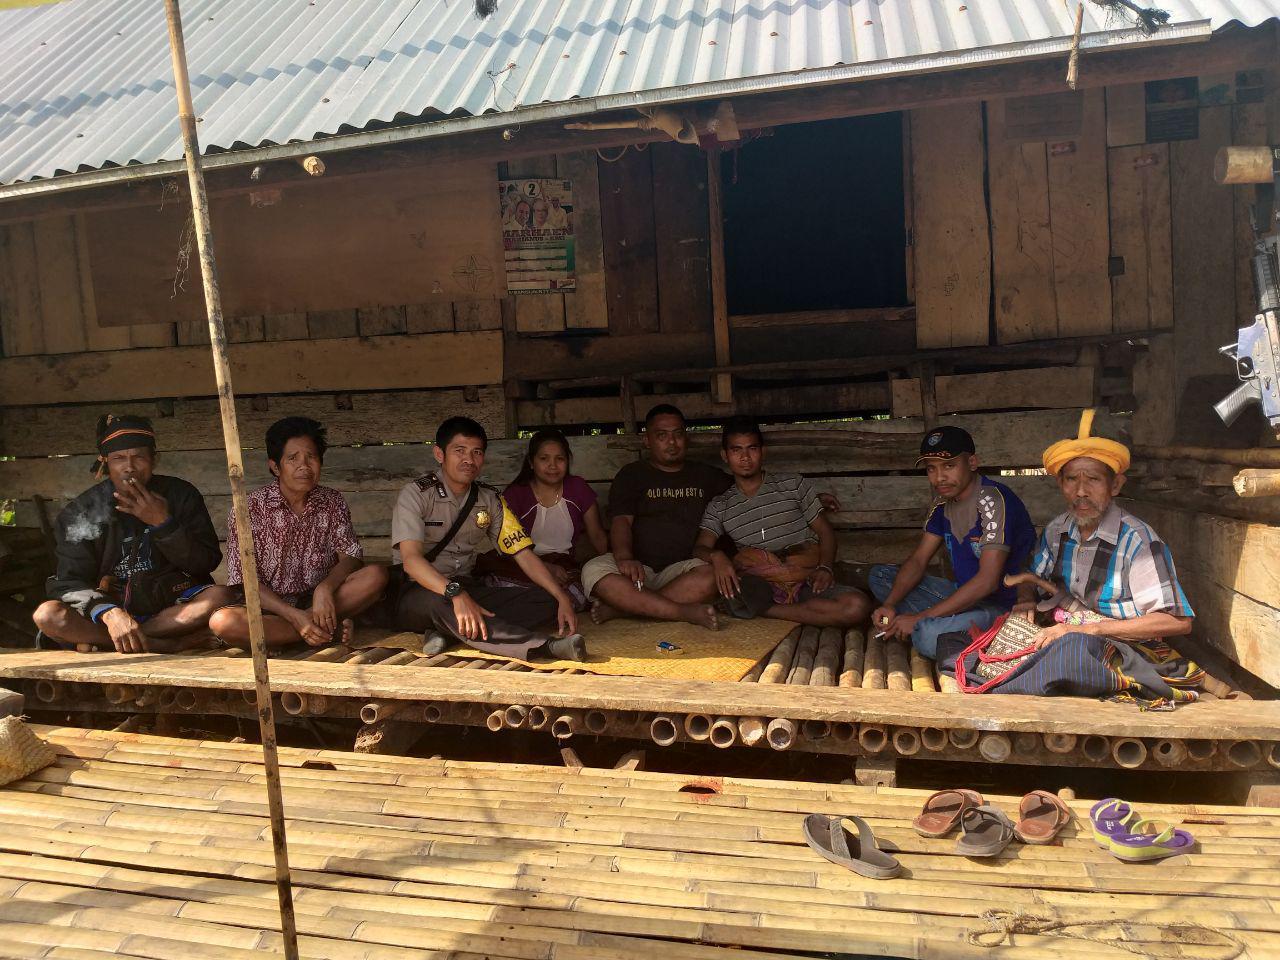 Sambangi Warga, Bhabinkamtibmas Mengajak Untuk Saling Bekerjasama Membangun Desa